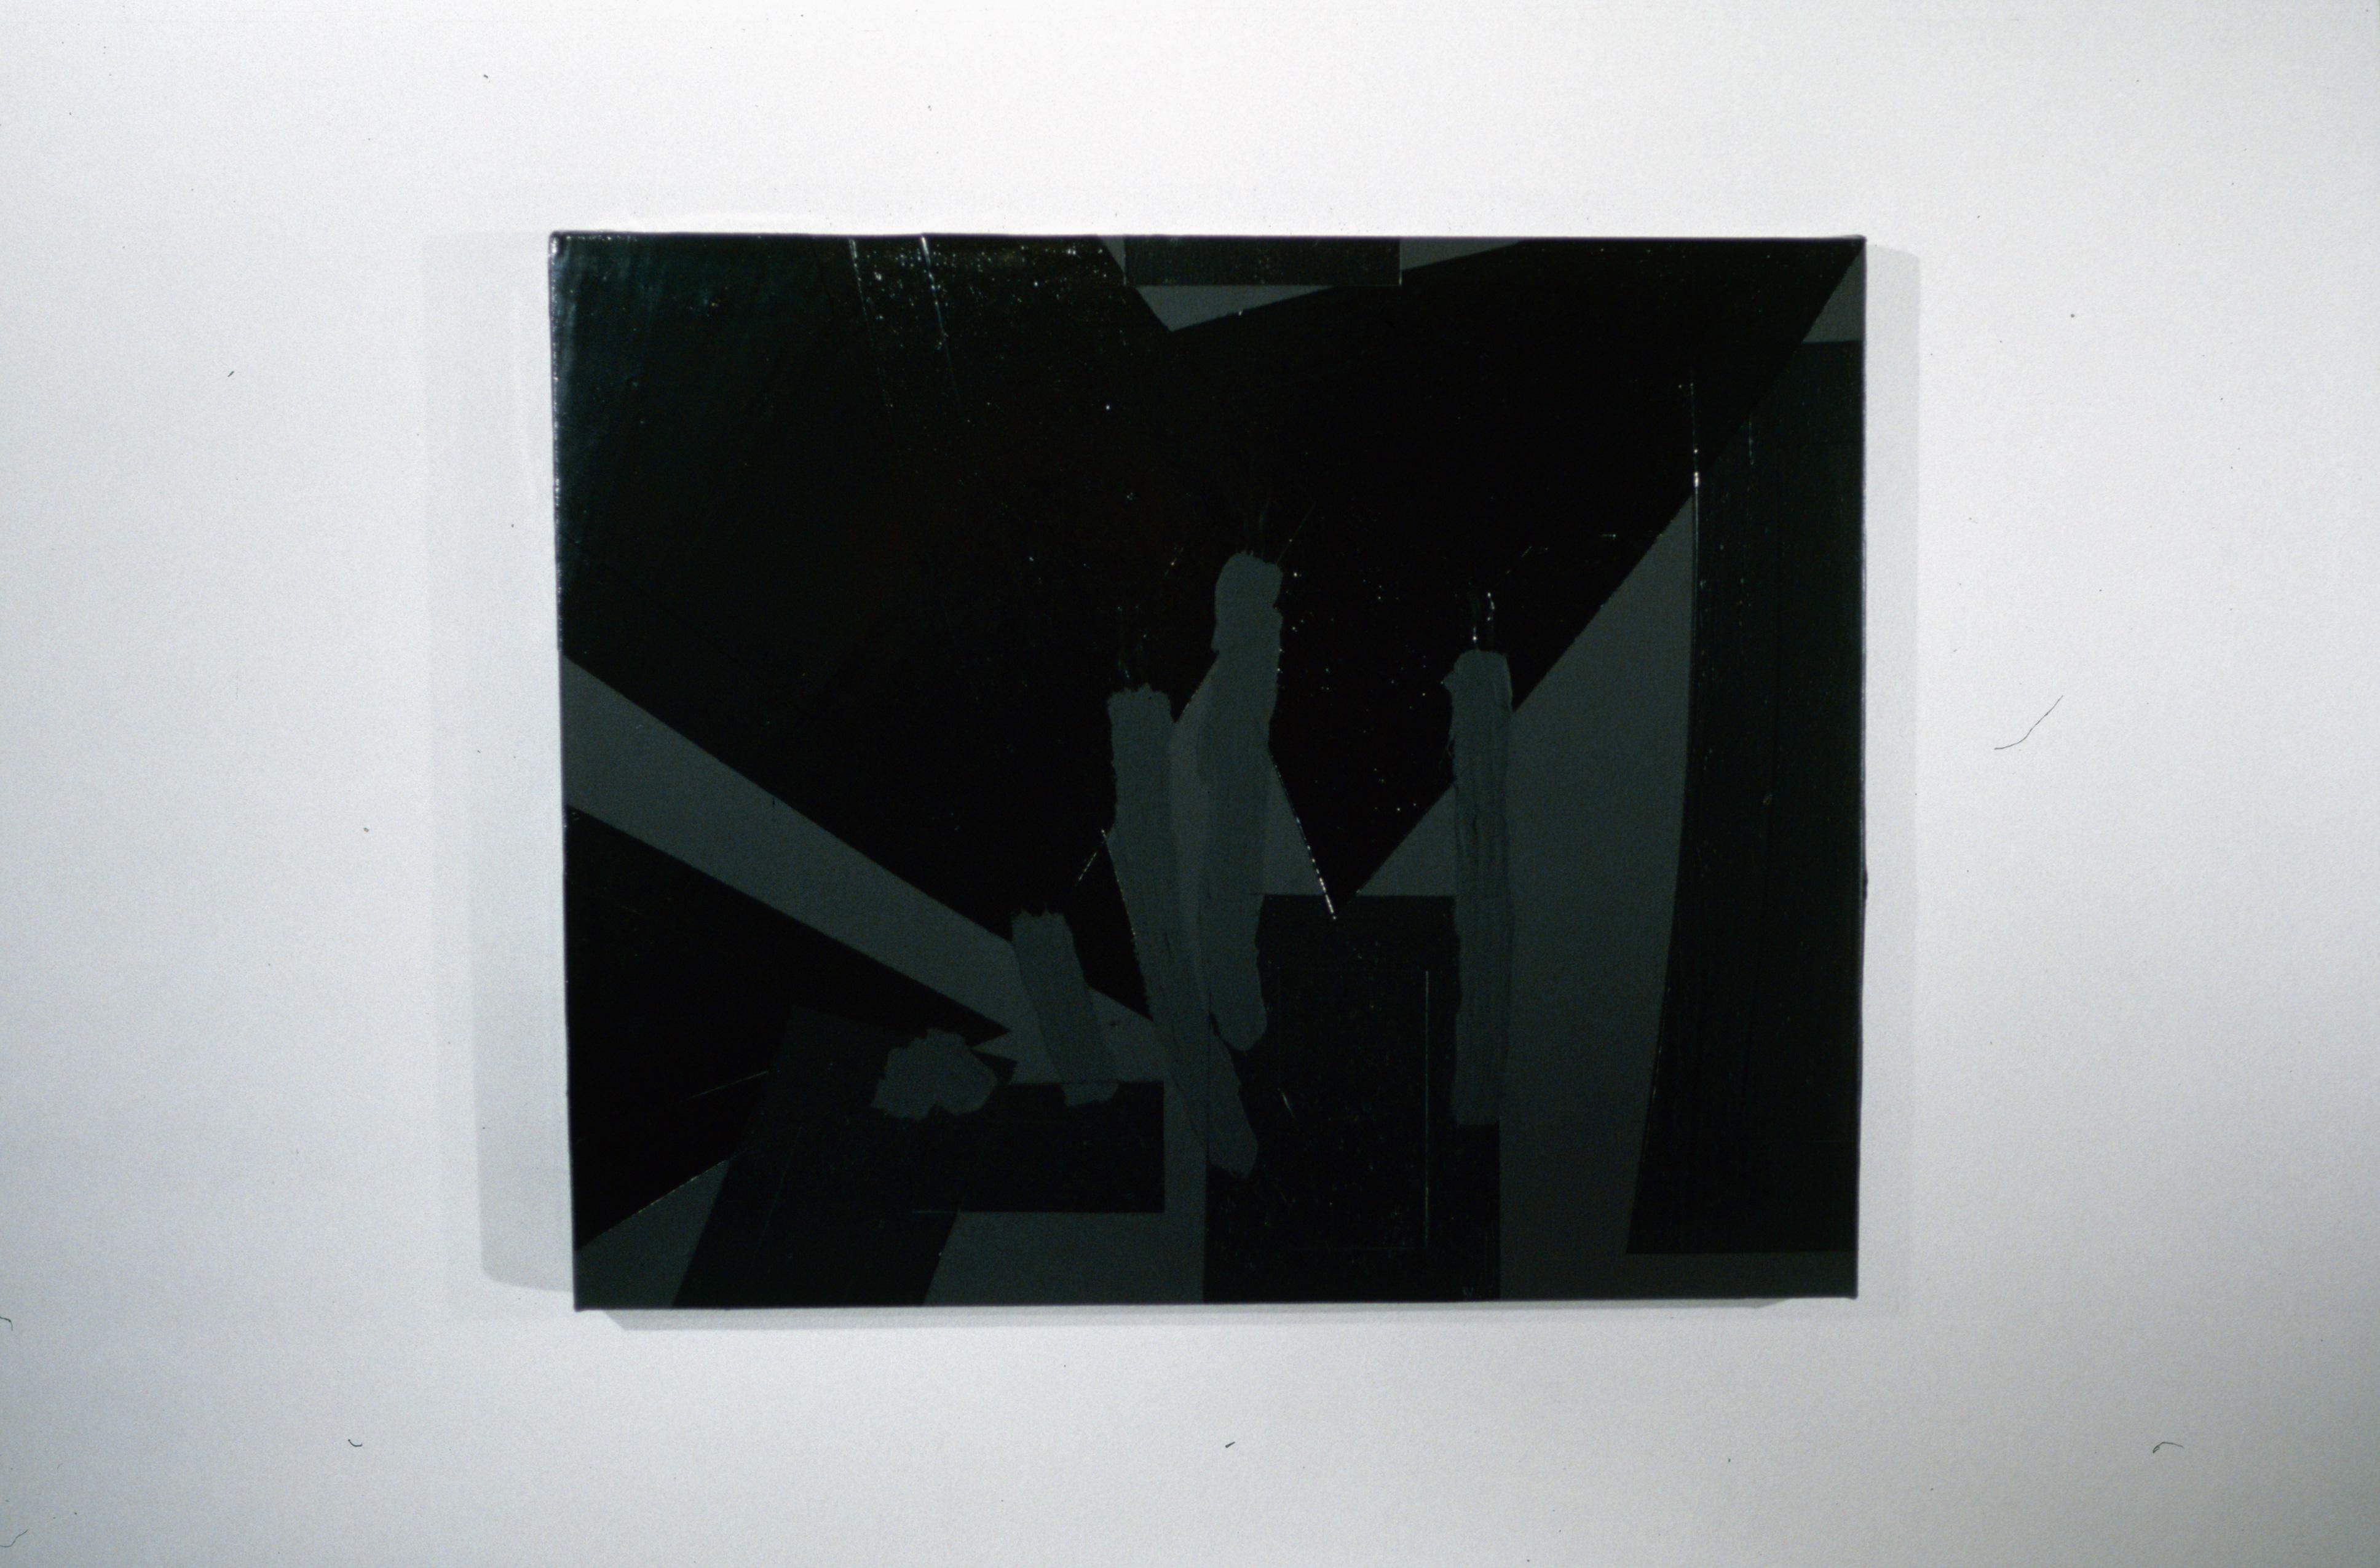 Black Study #04 | 31x25in | 2002